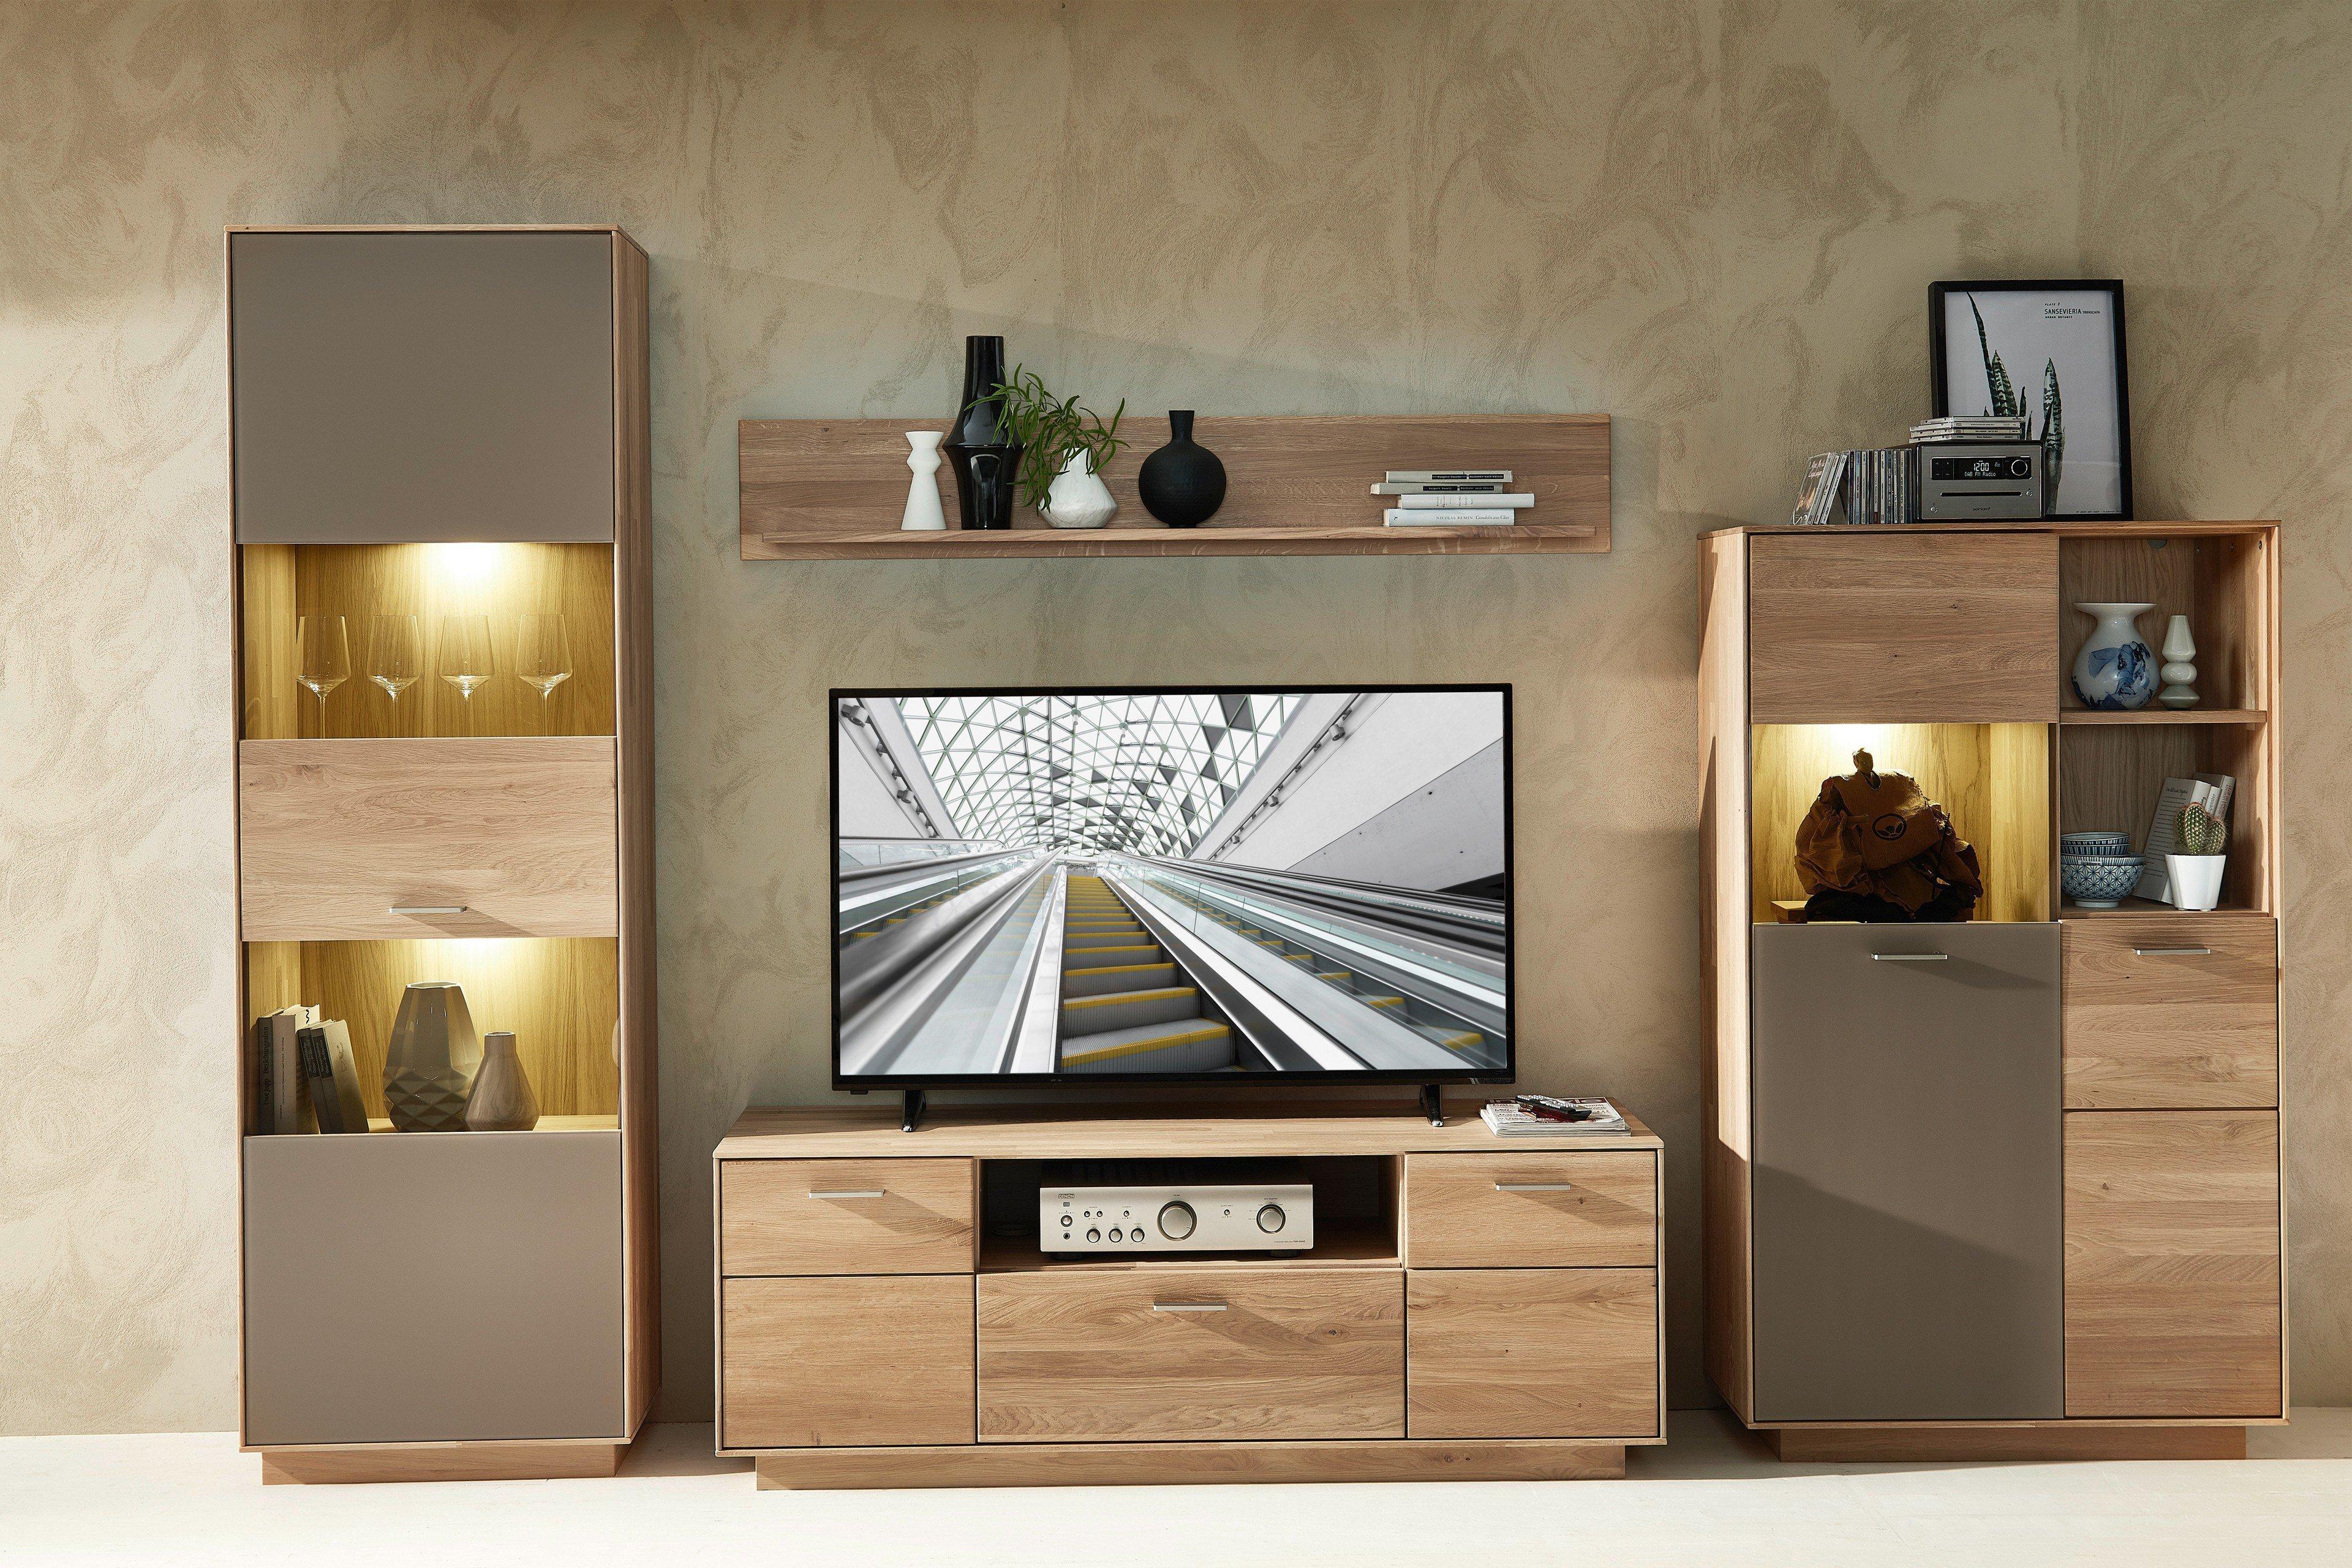 Linea concept wohnwand jeanne and jerome - Casada mobel wohnzimmer ...